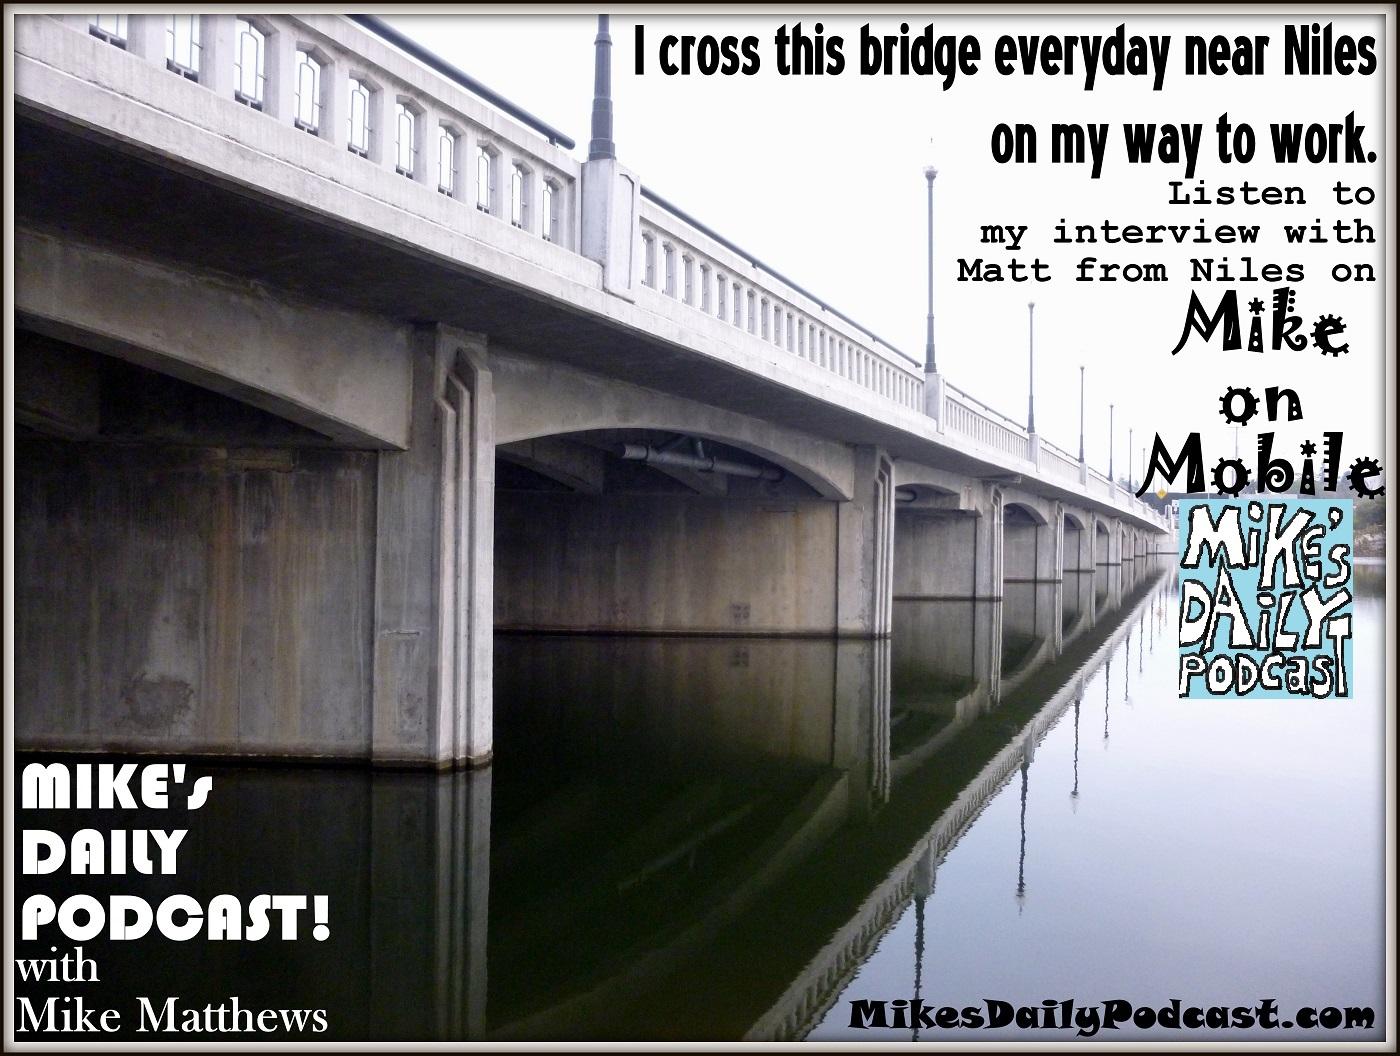 MIKEs DAILY PODCAST 944 Niles Alameda Creek Bridge CA